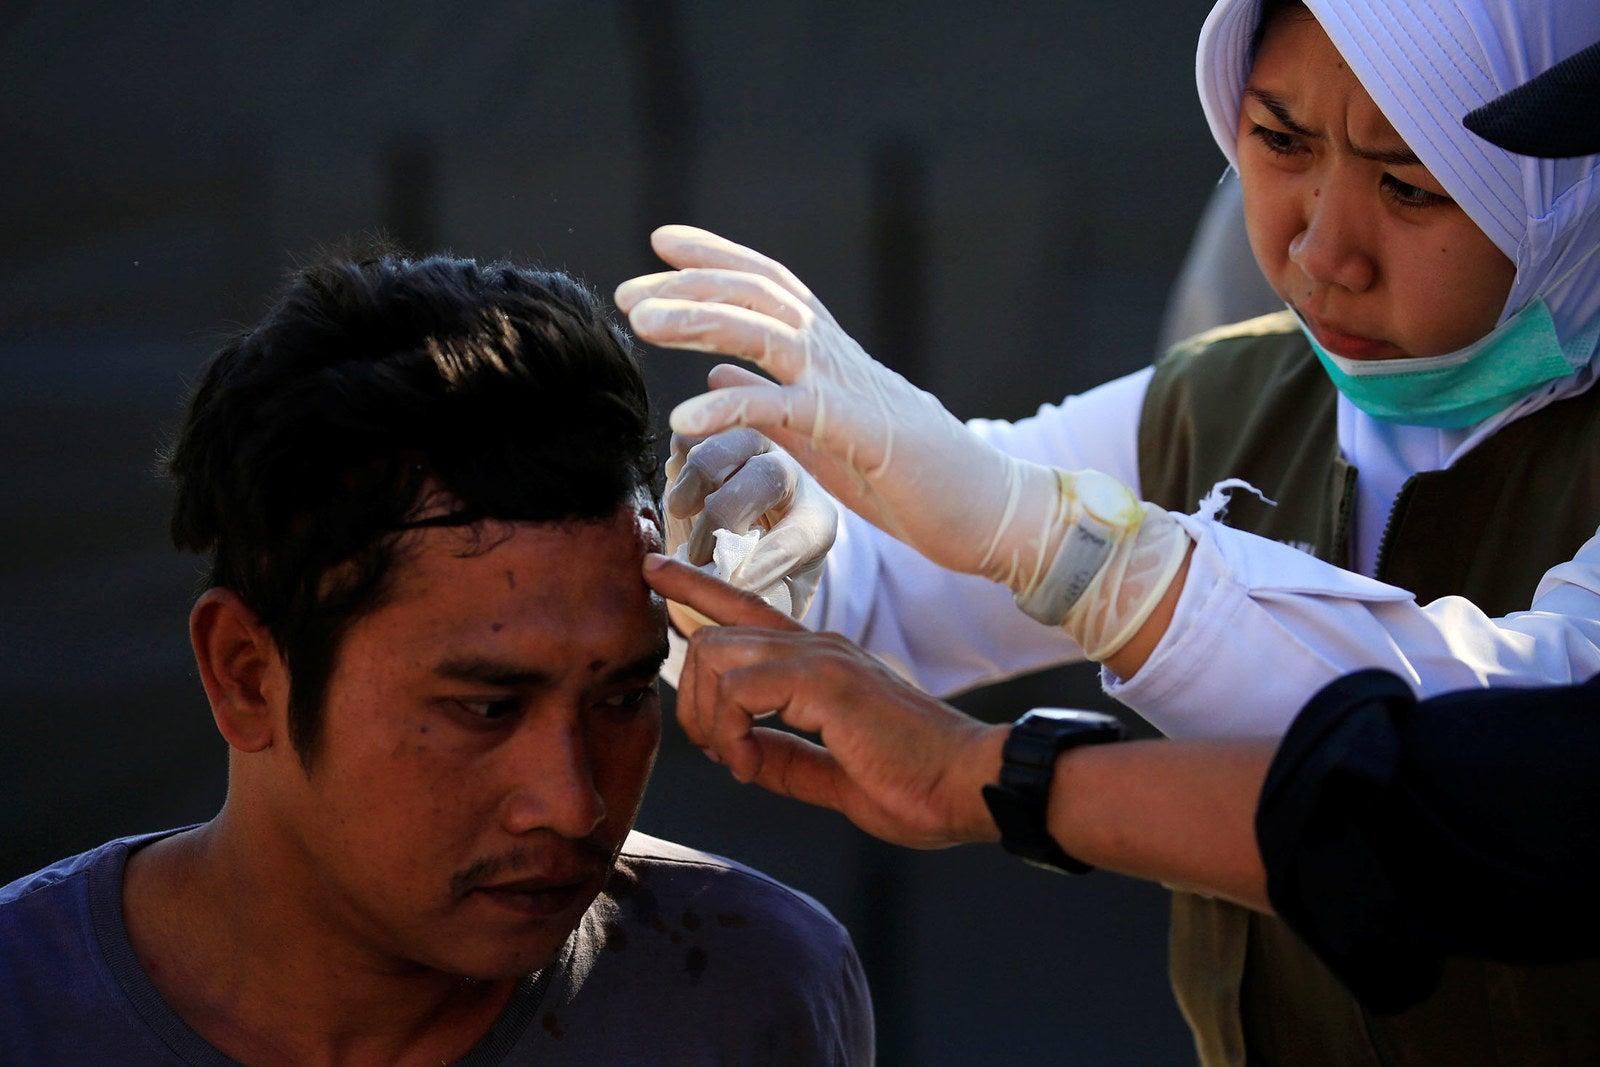 A paramedic treats an injured man outside the Tanjung hospital in Lombok Utara.